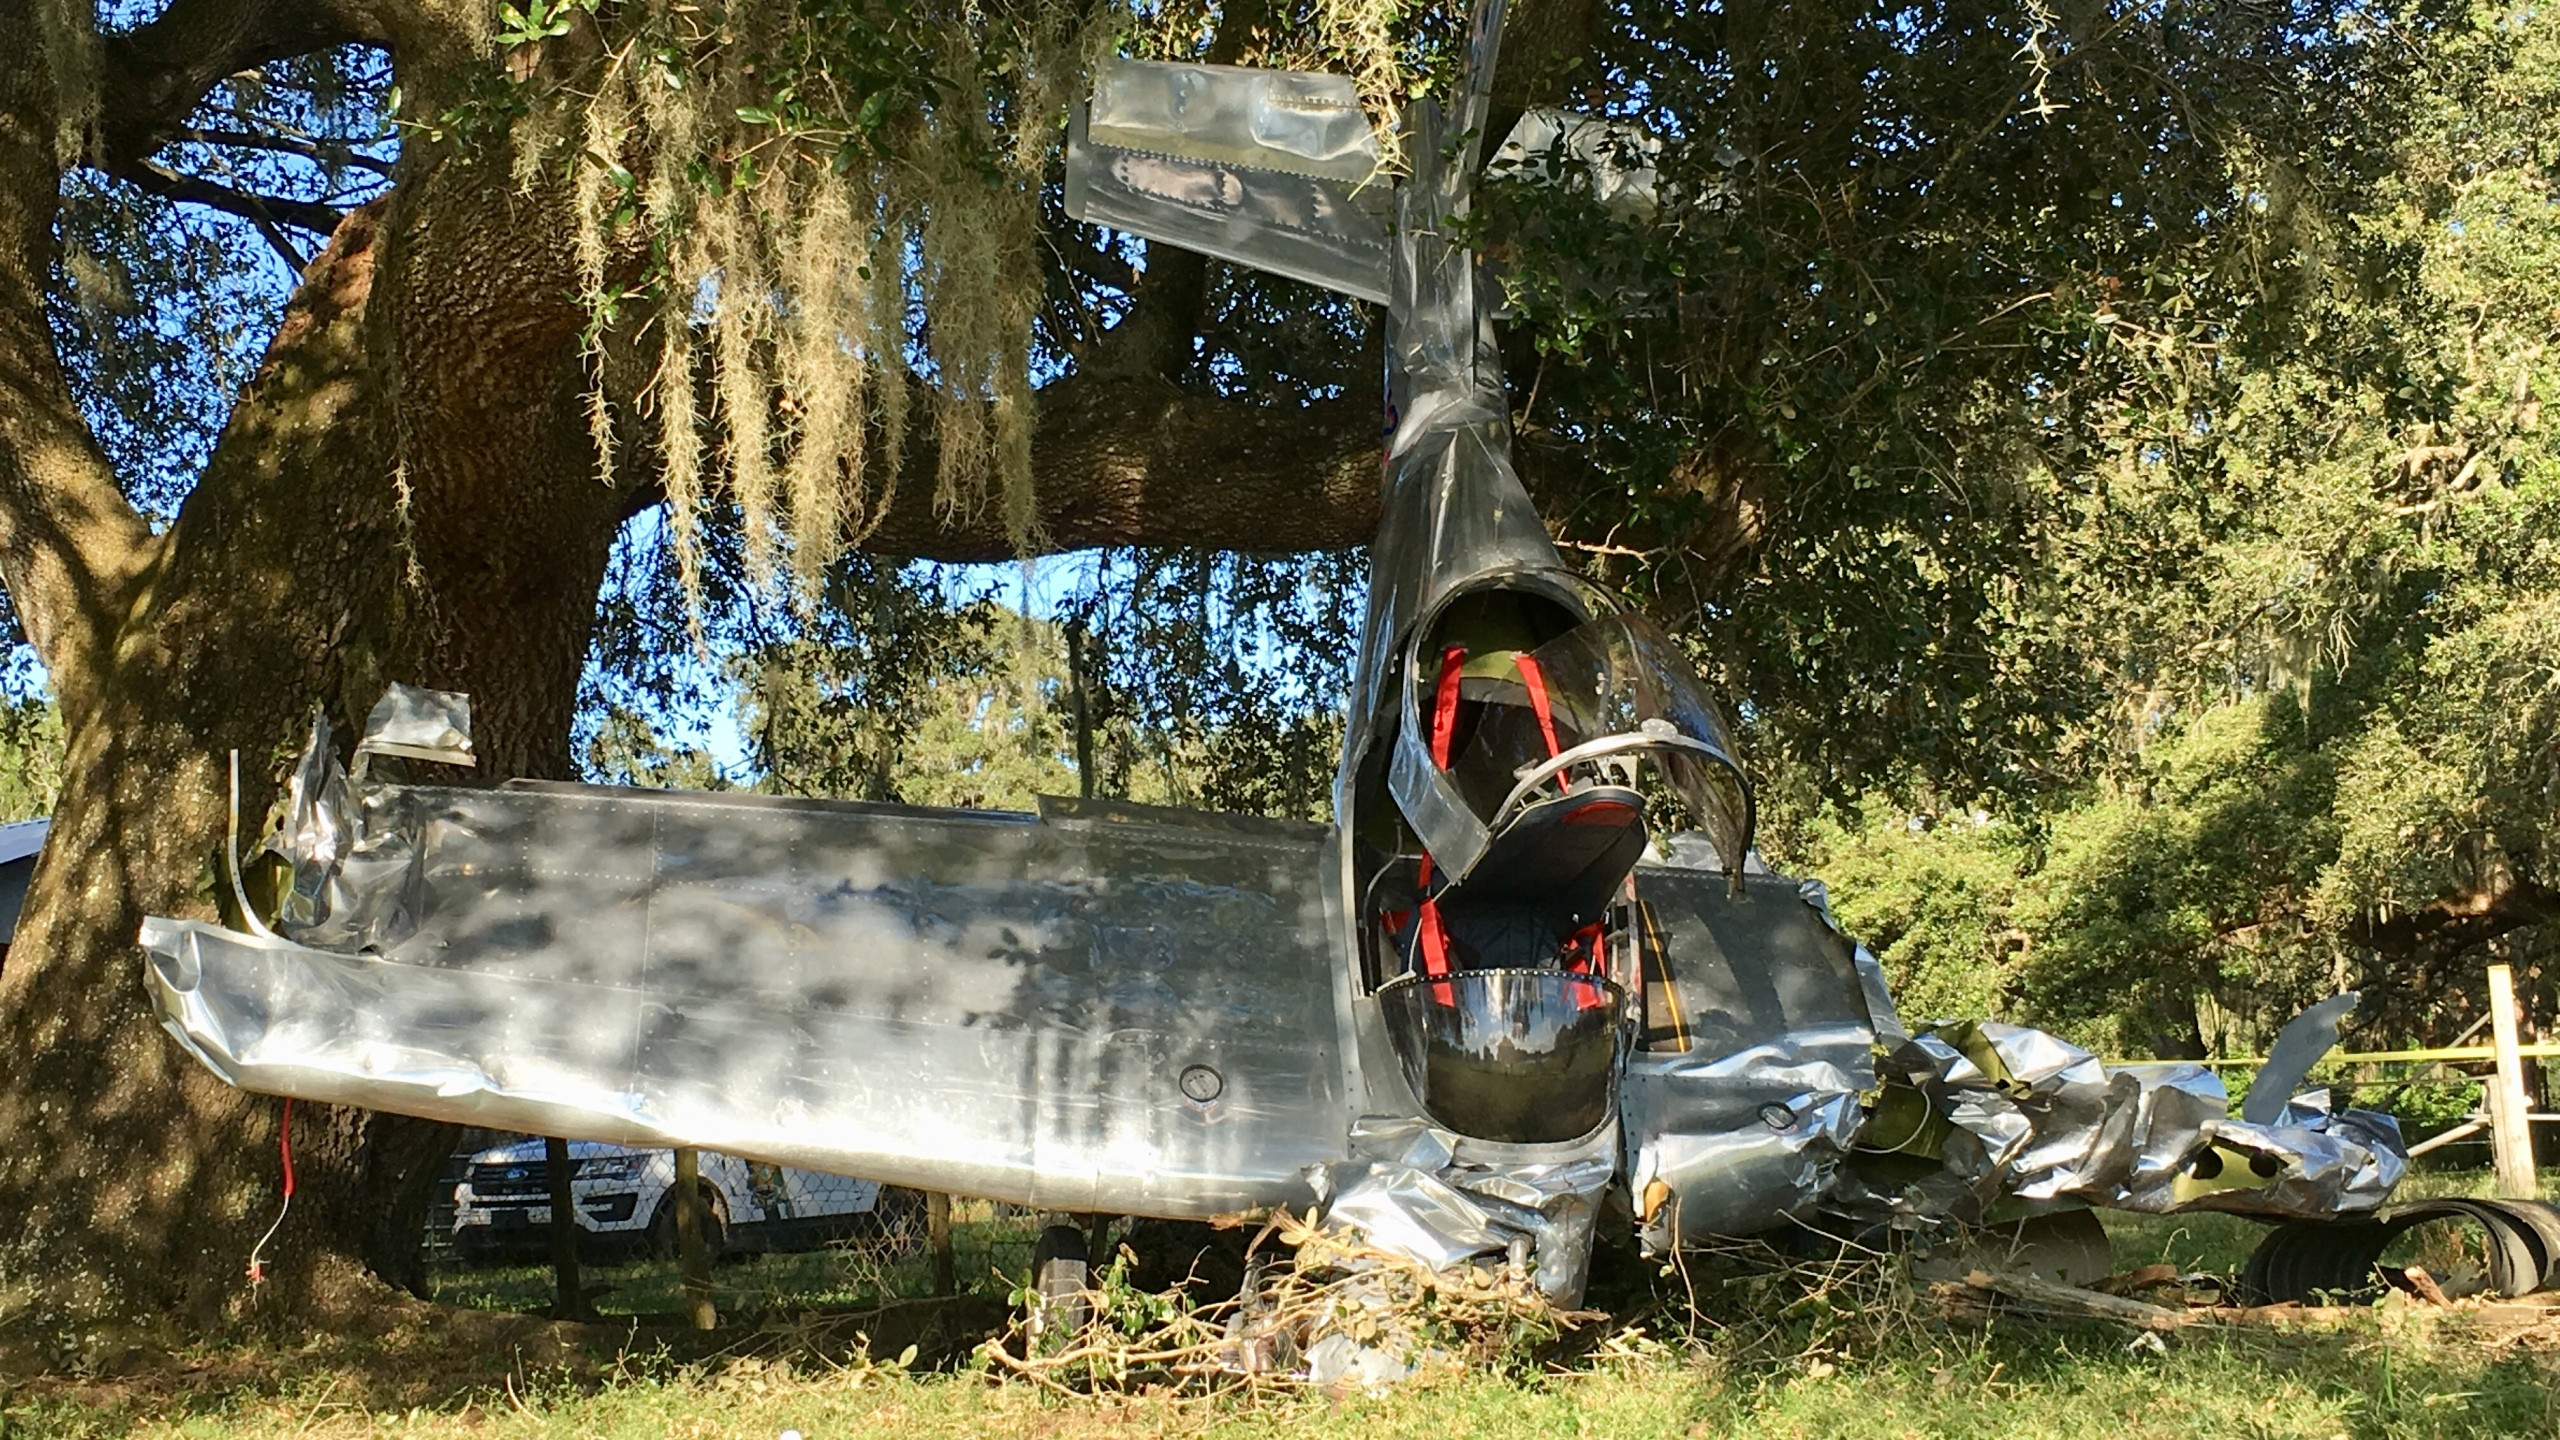 Pilot suffers minor injuries in homemade aircraft crash in Zephyrhills